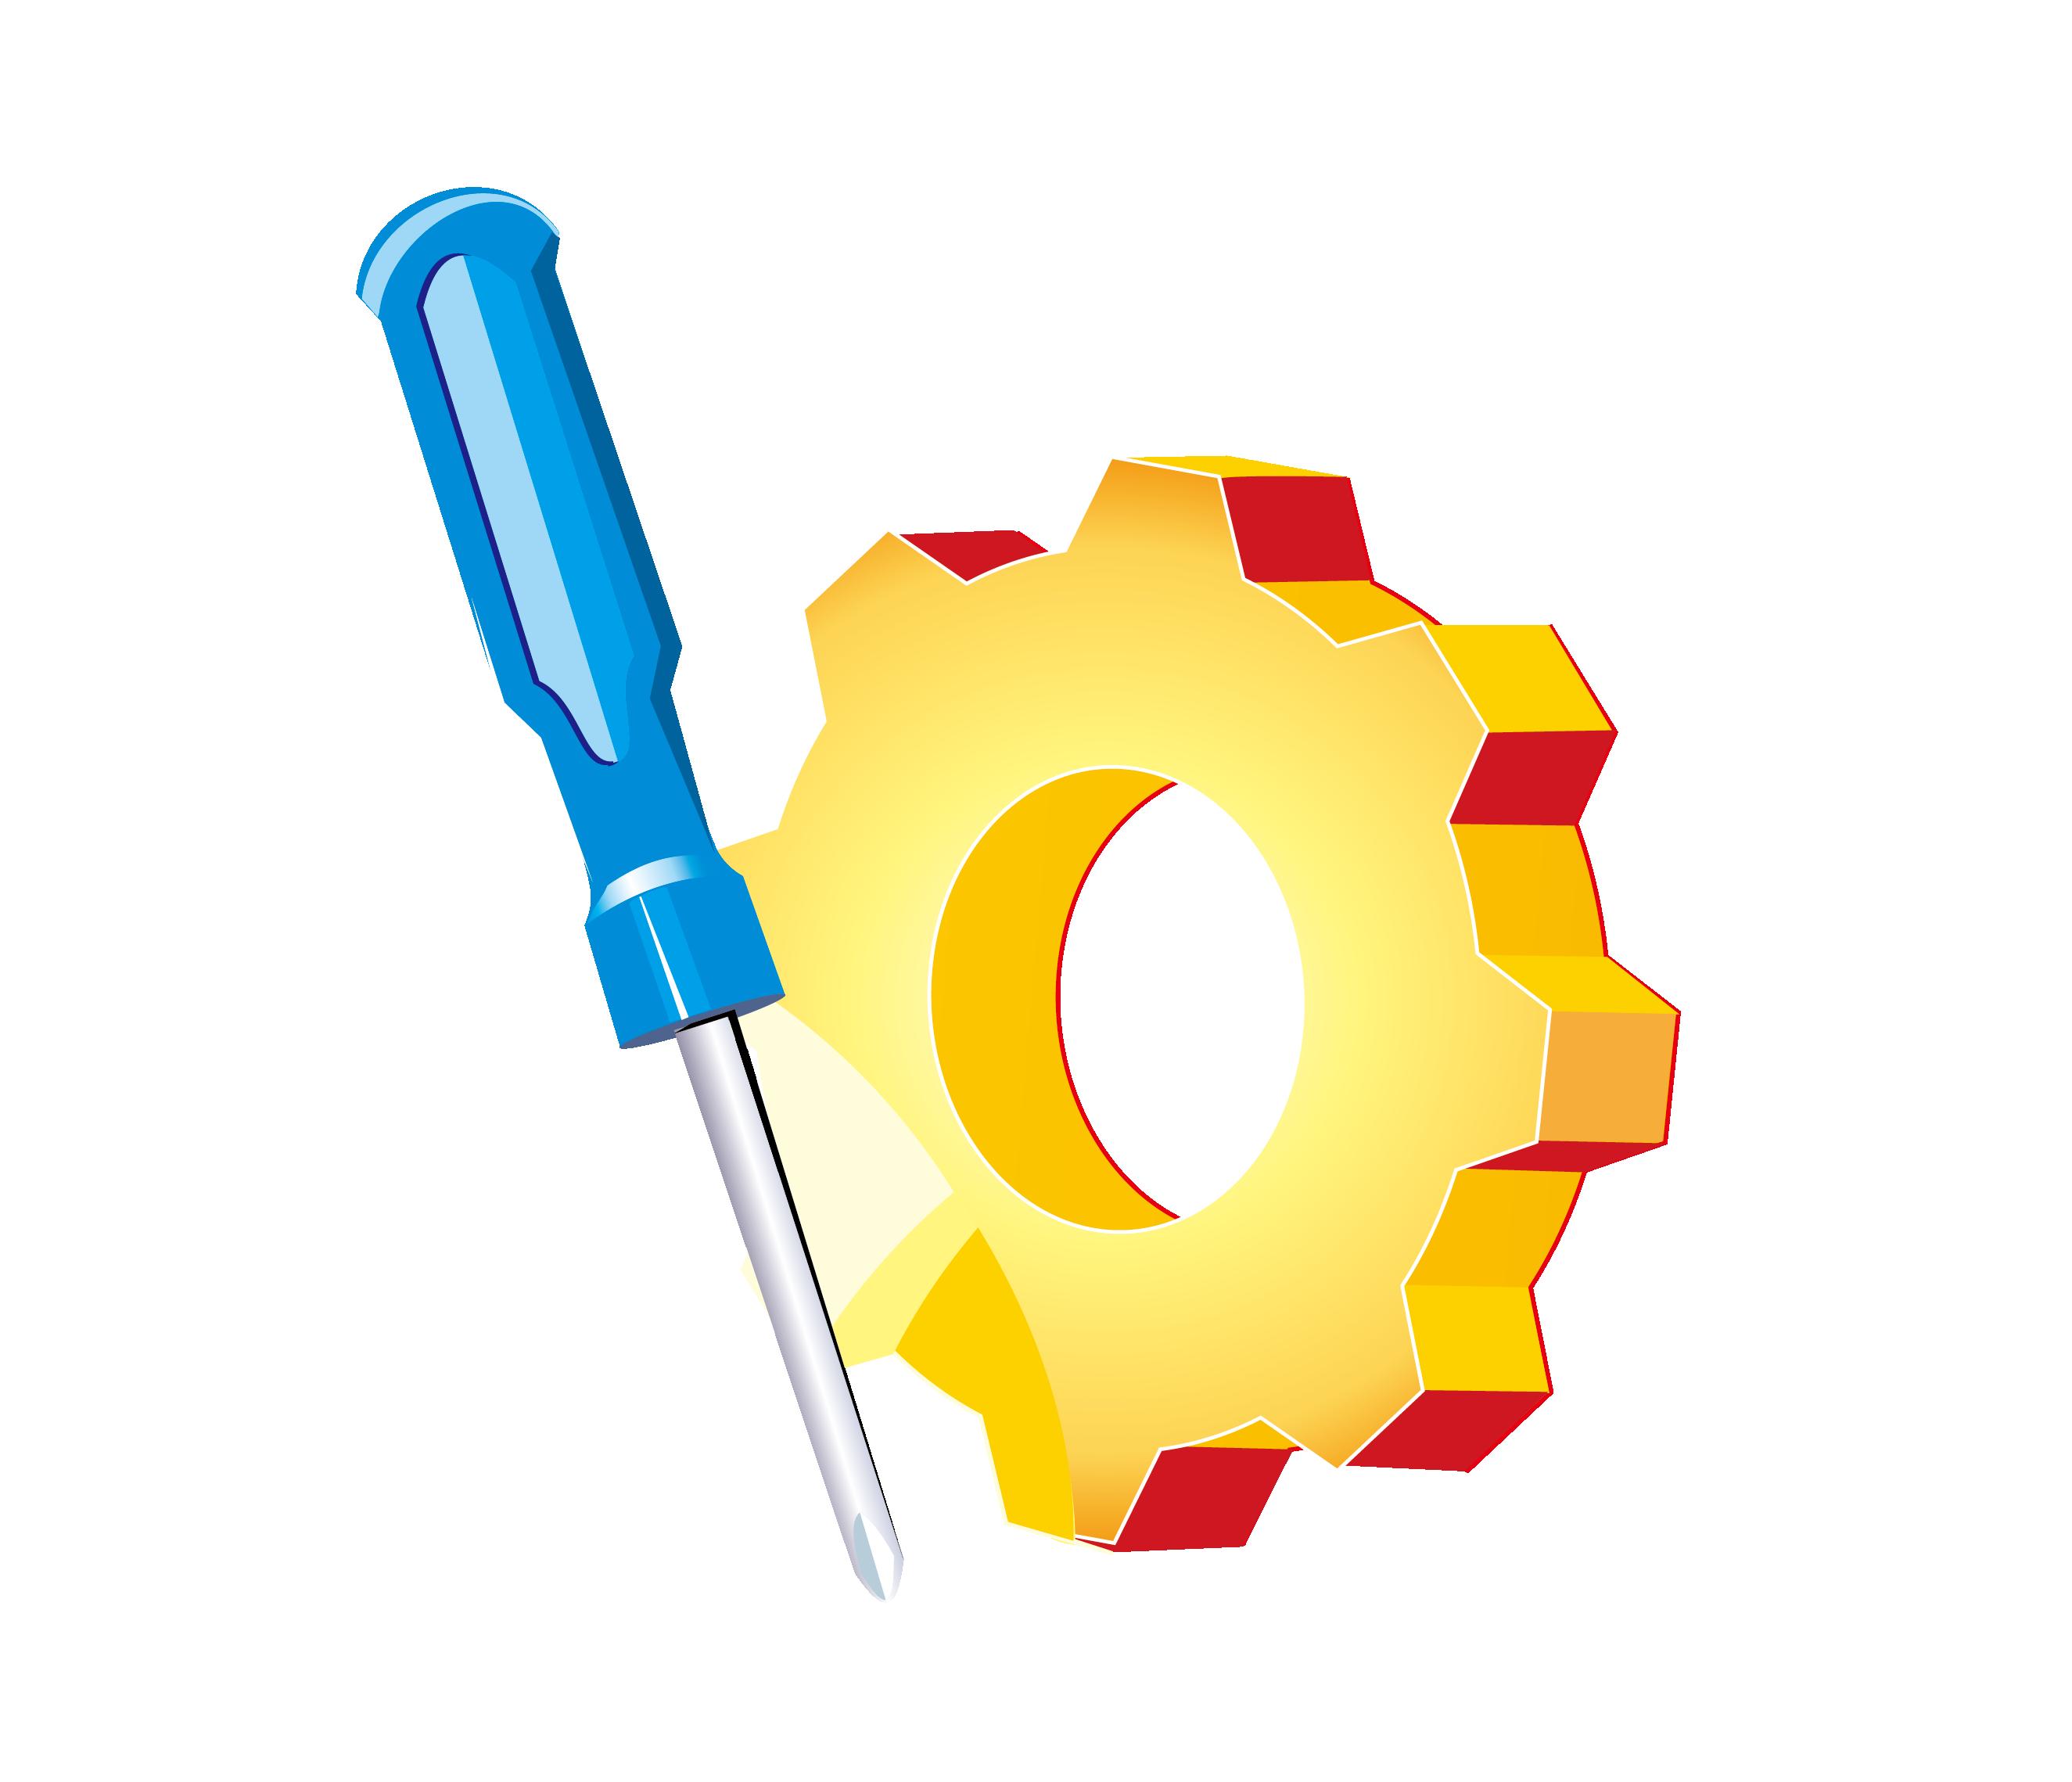 Computer network clip art. Screwdriver clipart orange